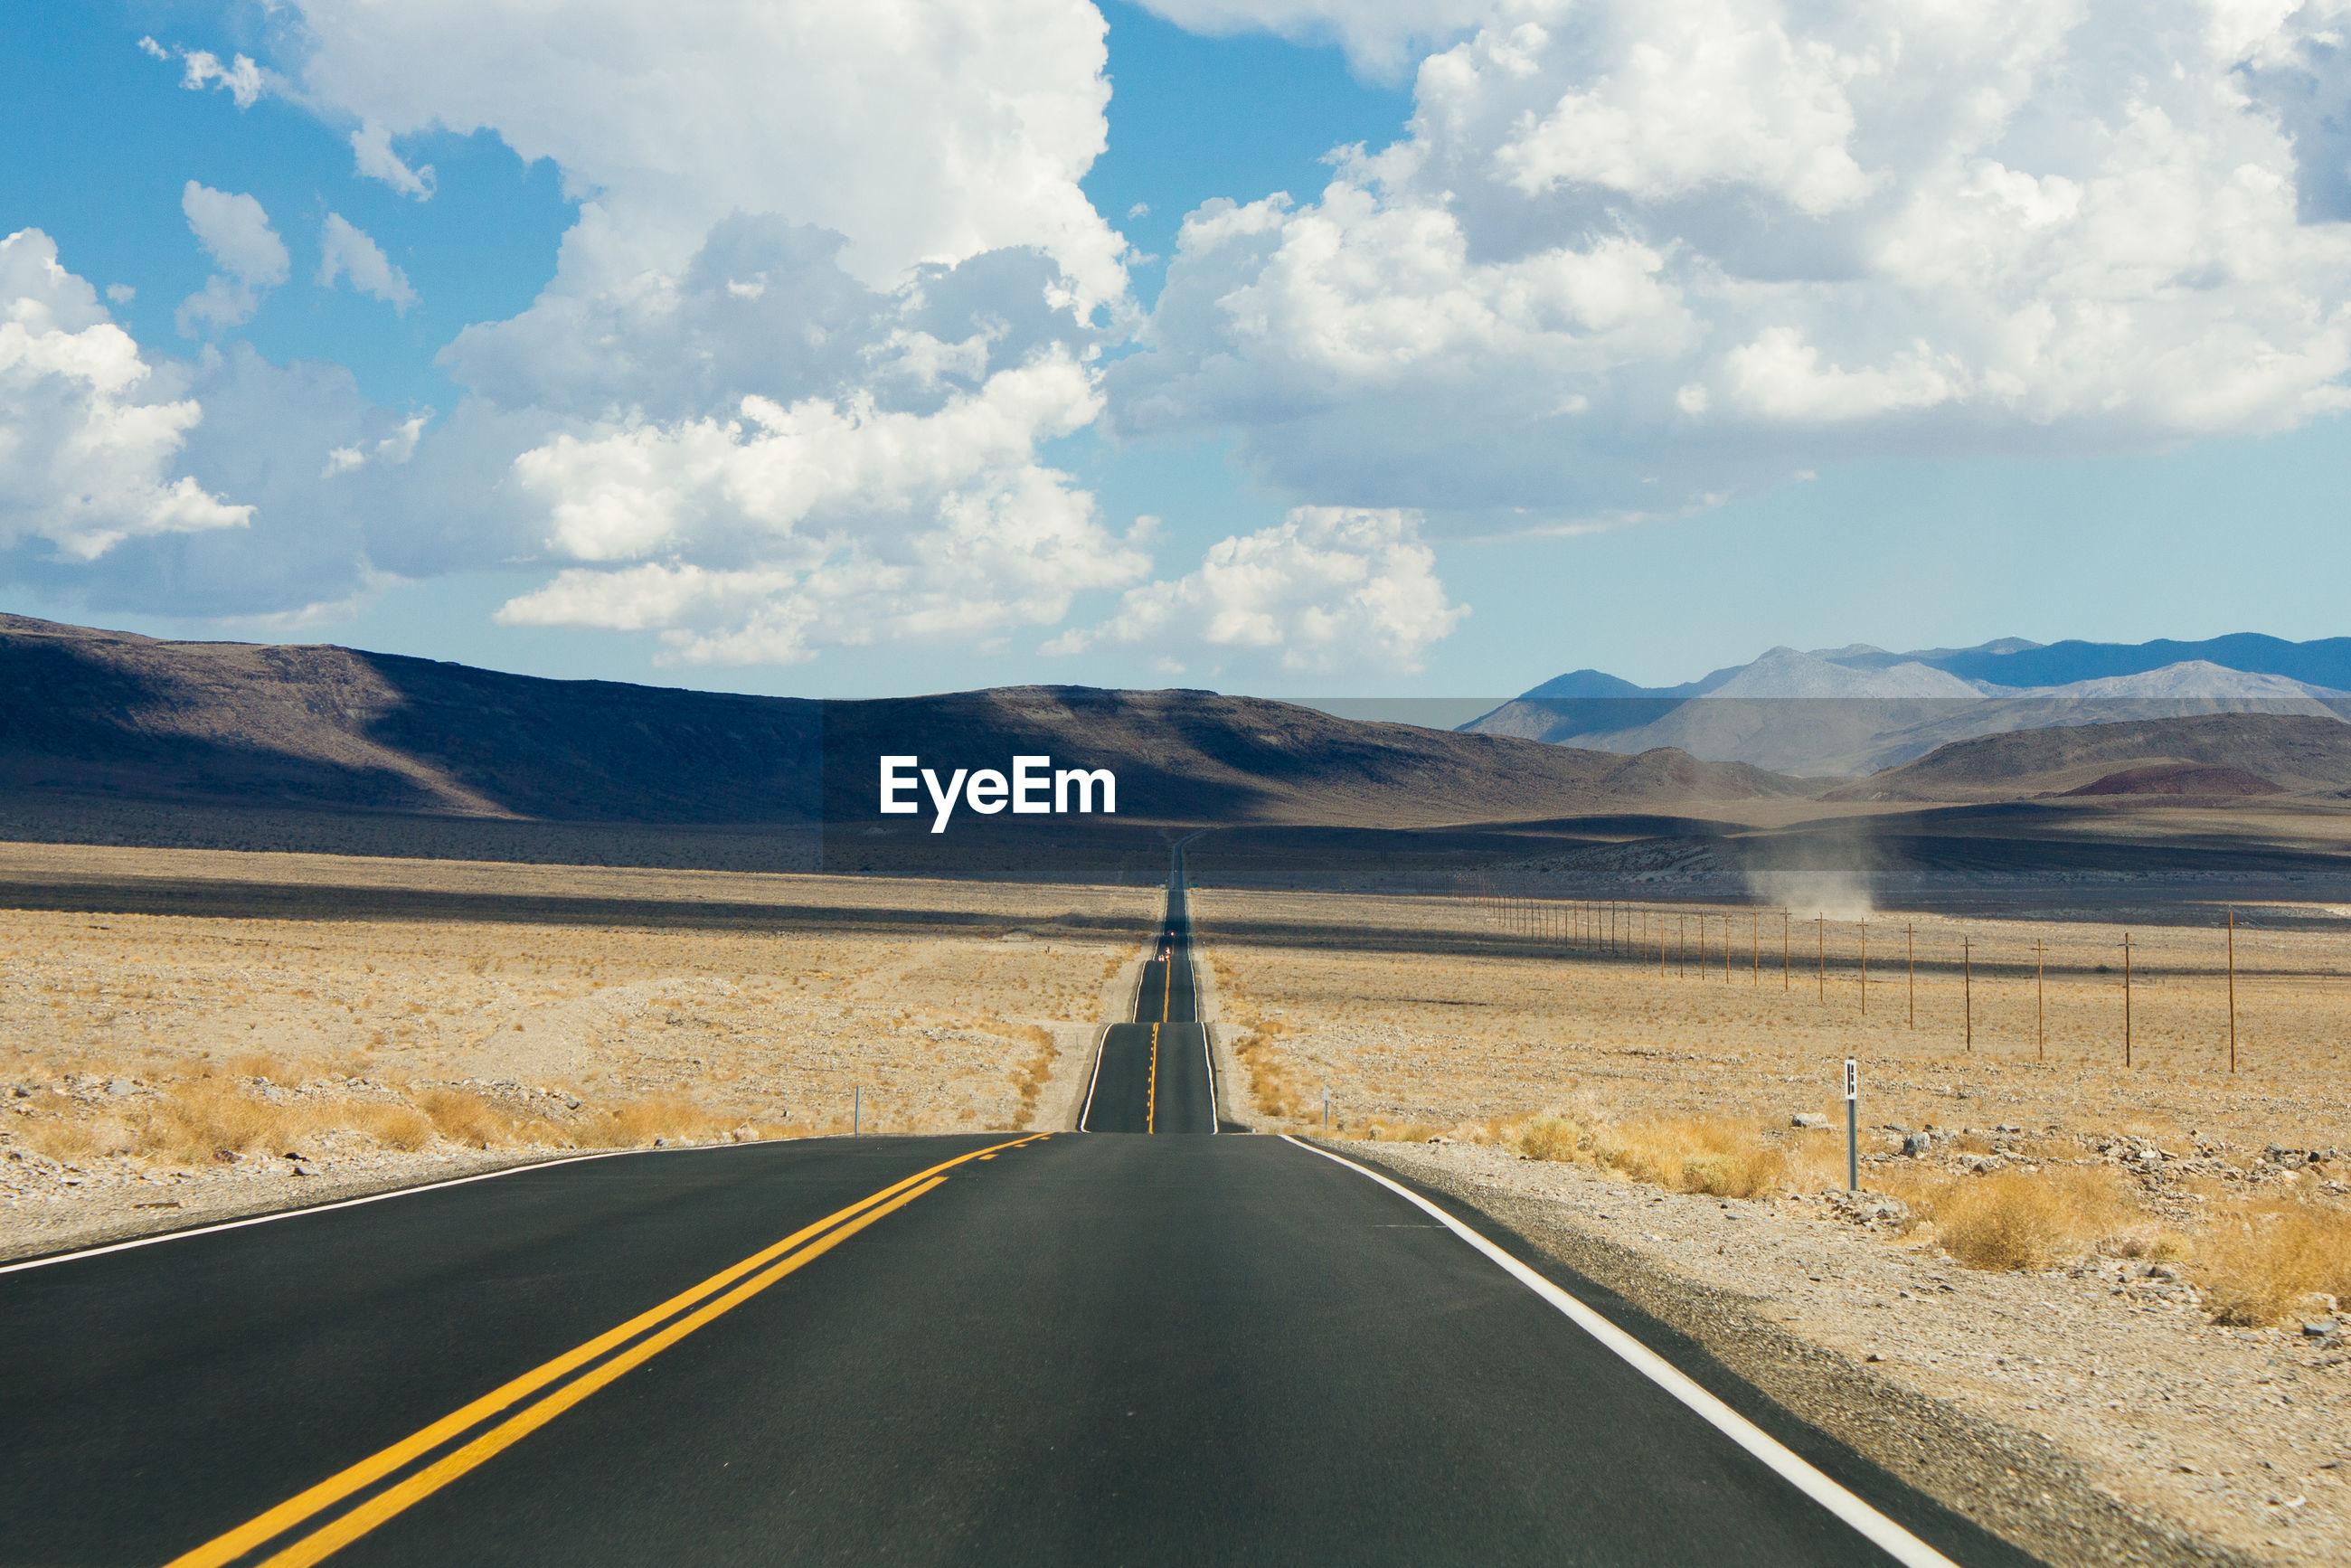 Empty desert road towards mountains against sky